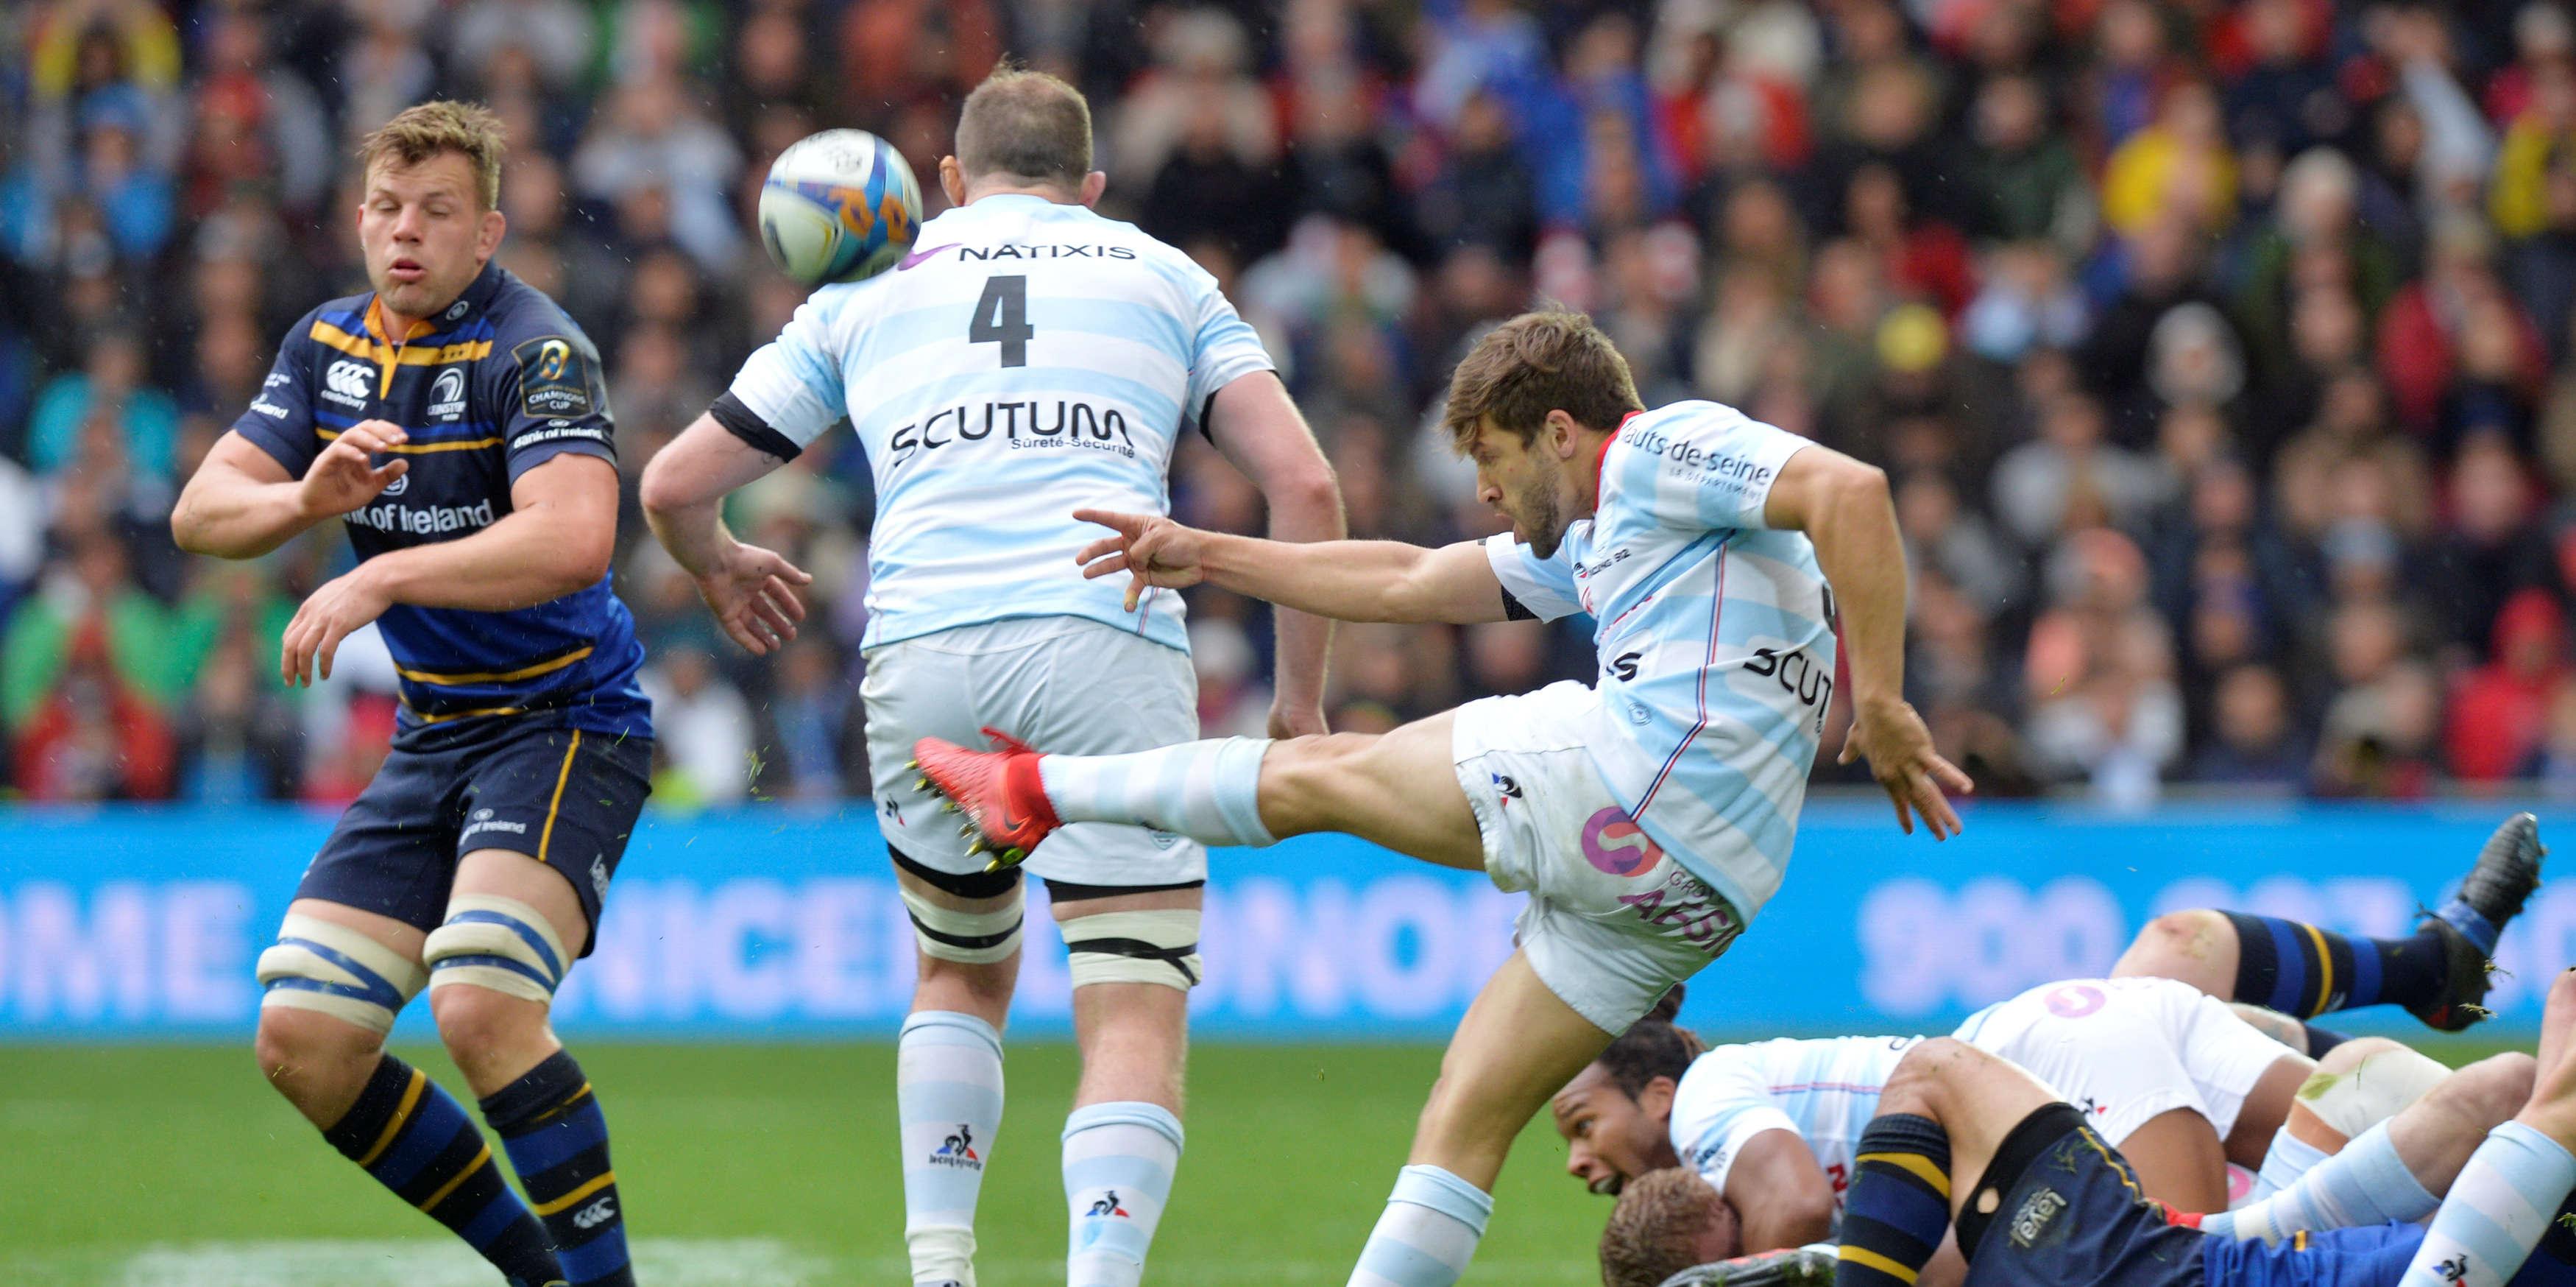 Rugby suivez racing 92 leinster en finale de coupe d europe en direct - Resultat coupe d europe de rugby en direct ...